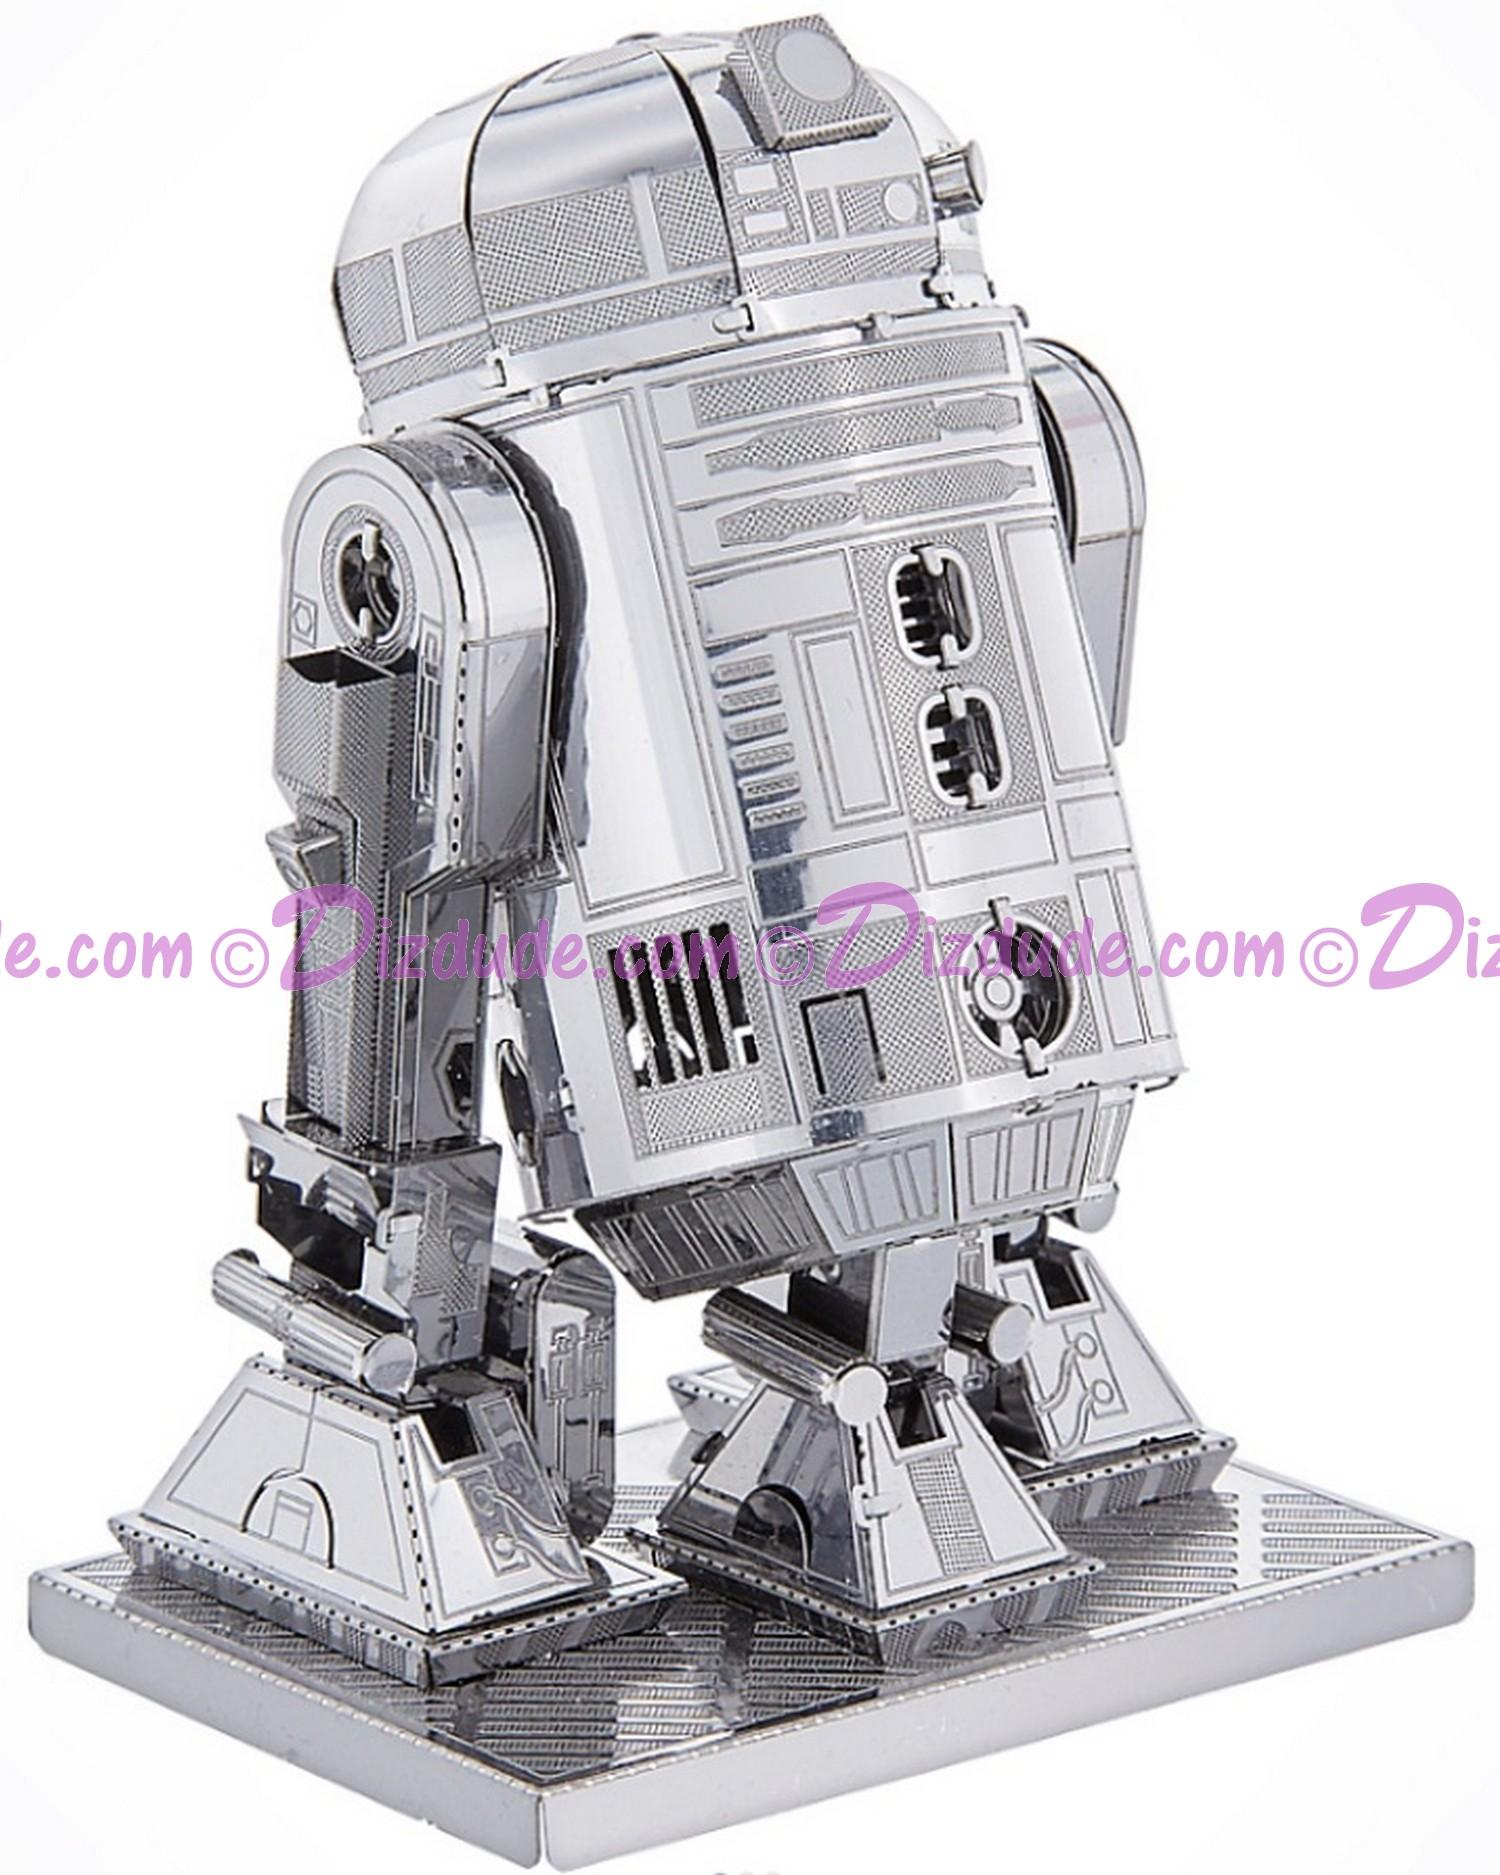 Disney Star Wars R2-D2 3D Metal Model Kit © Dizdude.com